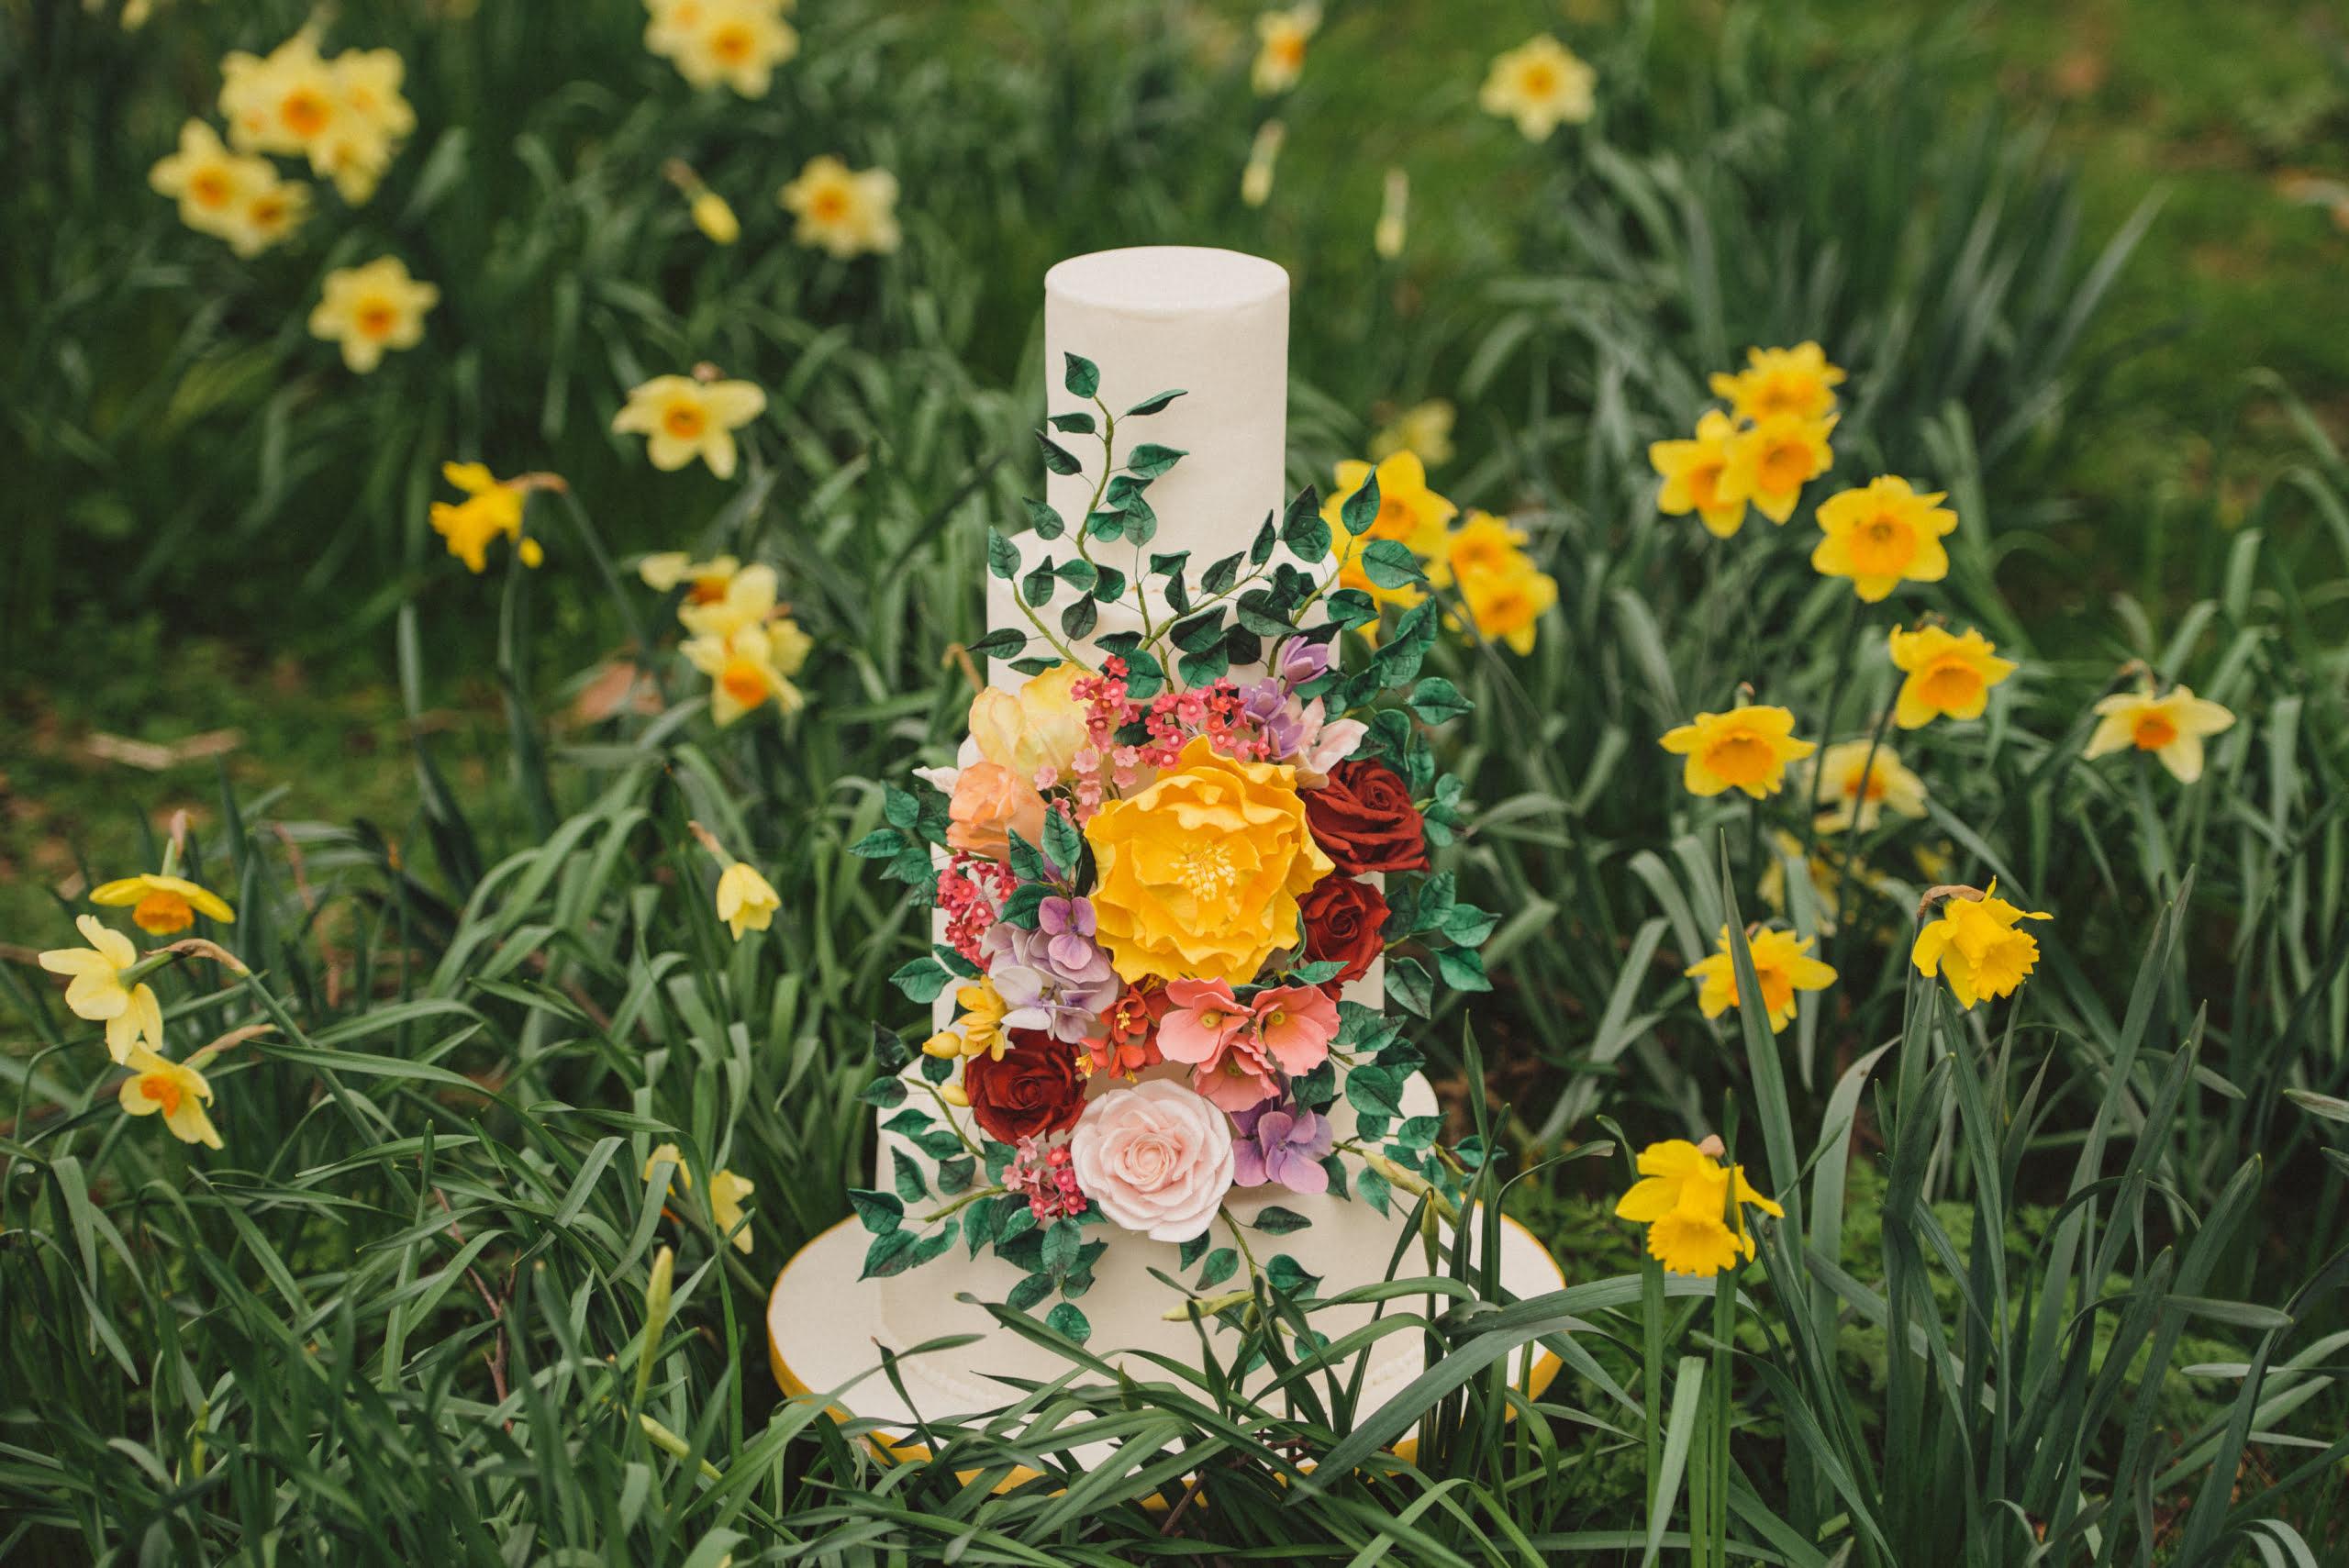 Bluebell Kitchen bold bright sugar flowers in Spring